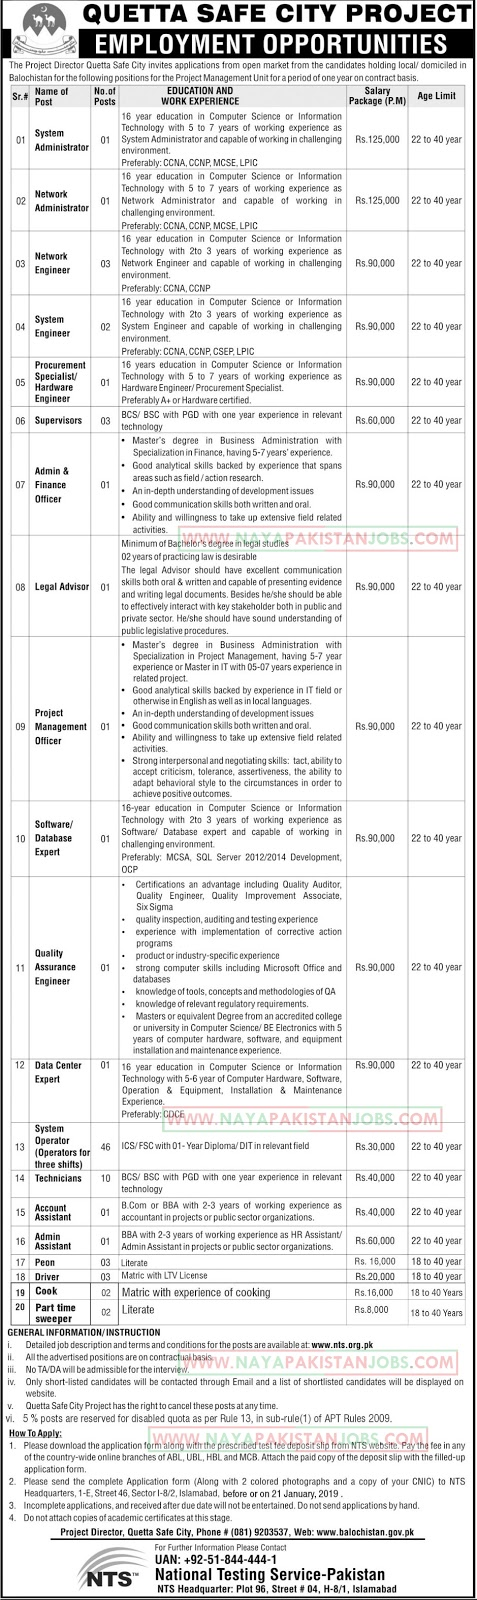 Quetta Safe City Project Jobs Jan 2019 NTS Application form, Quetta Safe City Project Jobs by NTS